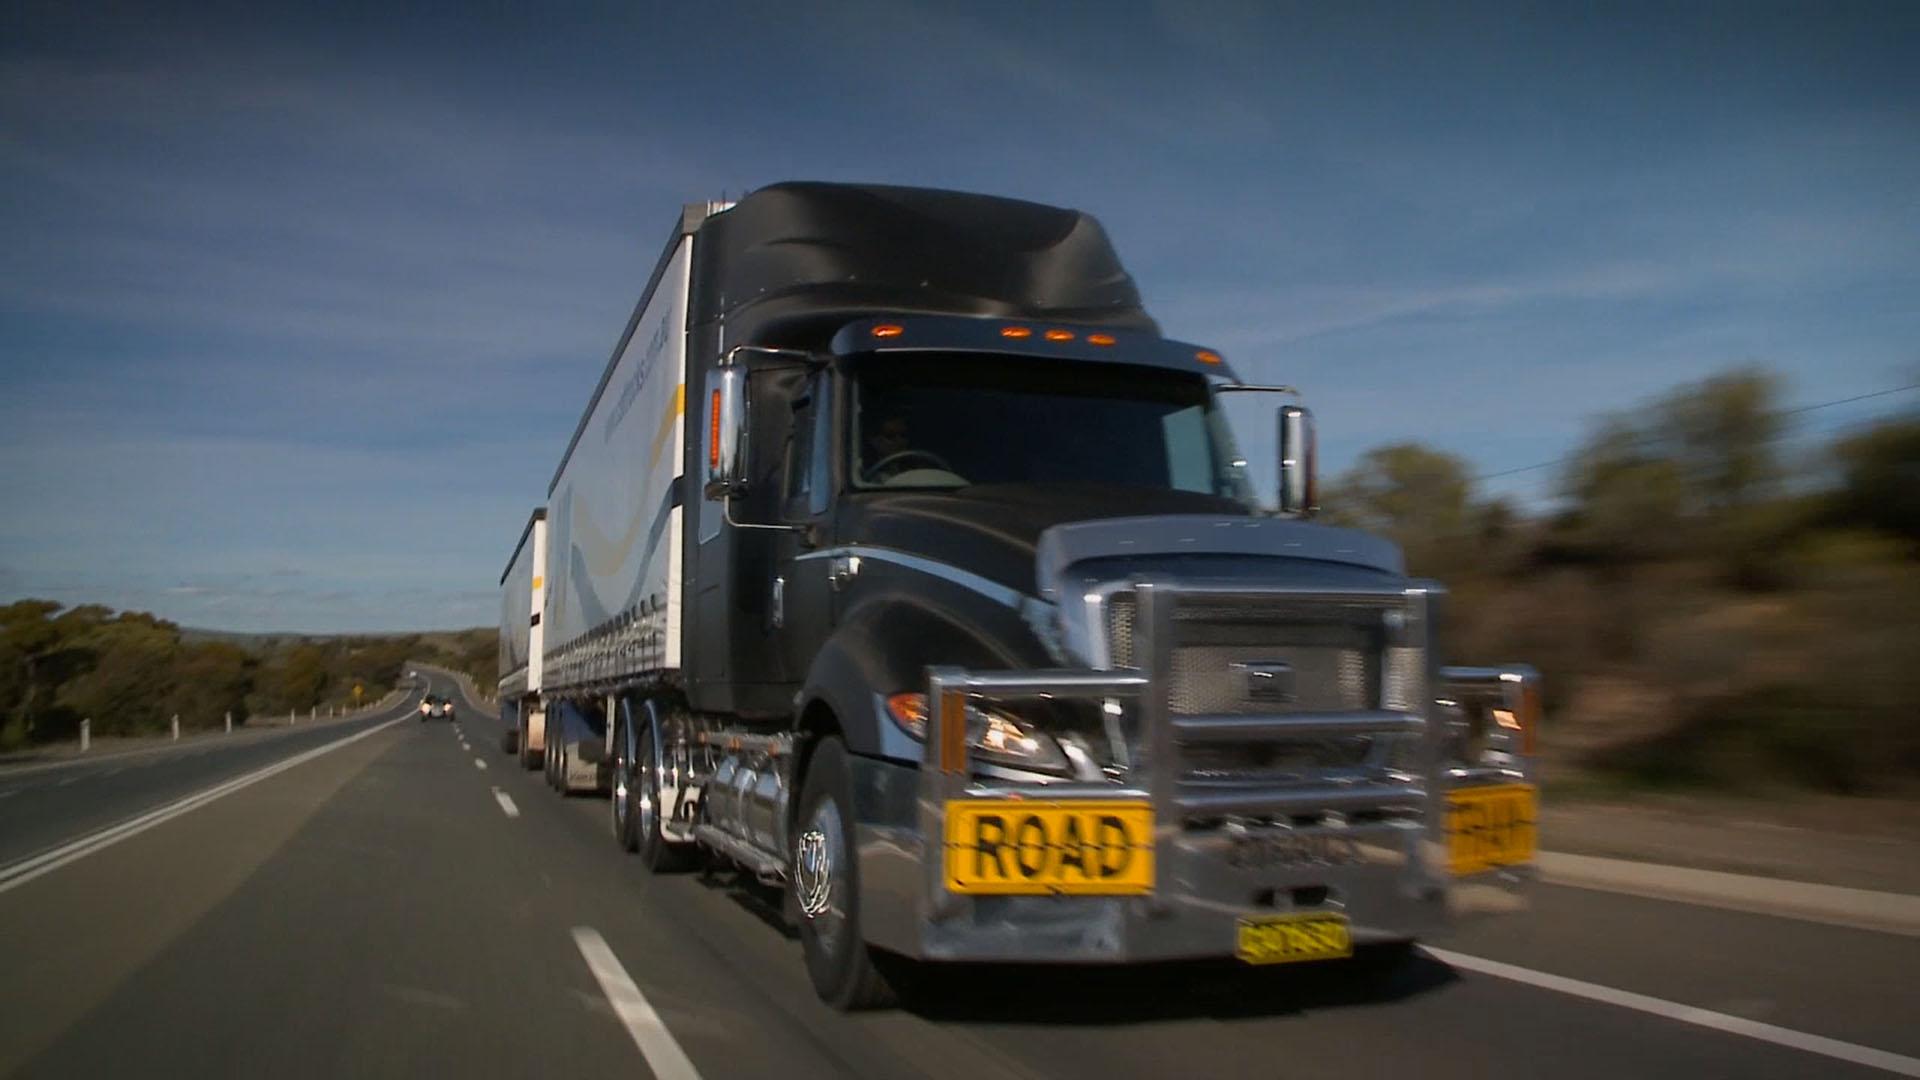 Onboard Truck Scales Road Train